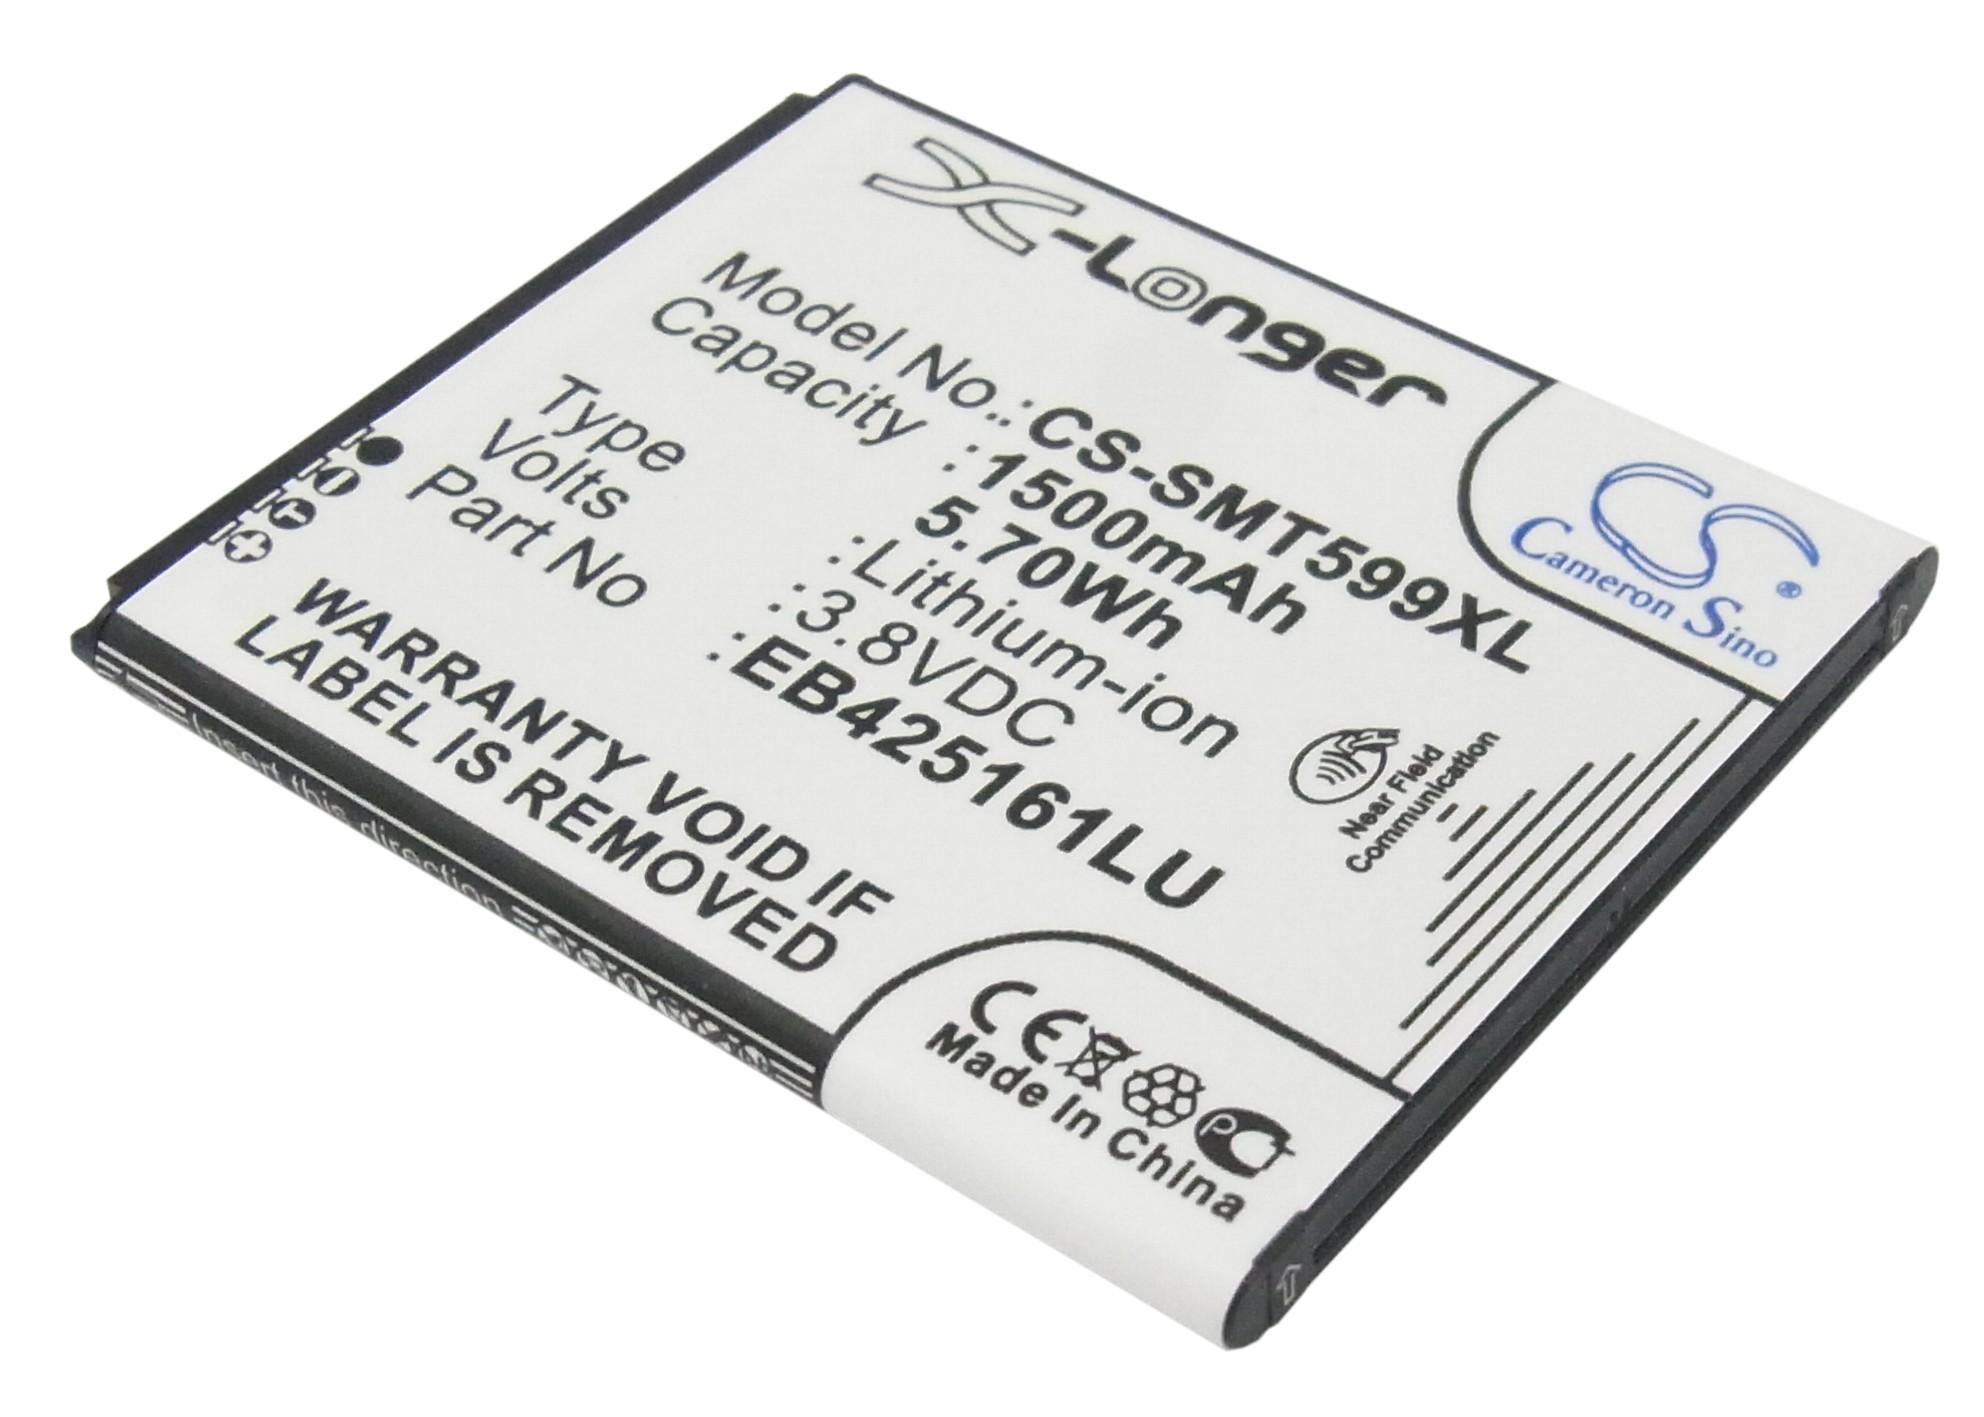 Cameron Sino baterie do mobilů pro SAMSUNG GT-S7562 3.8V Li-ion 1500mAh černá - neoriginální